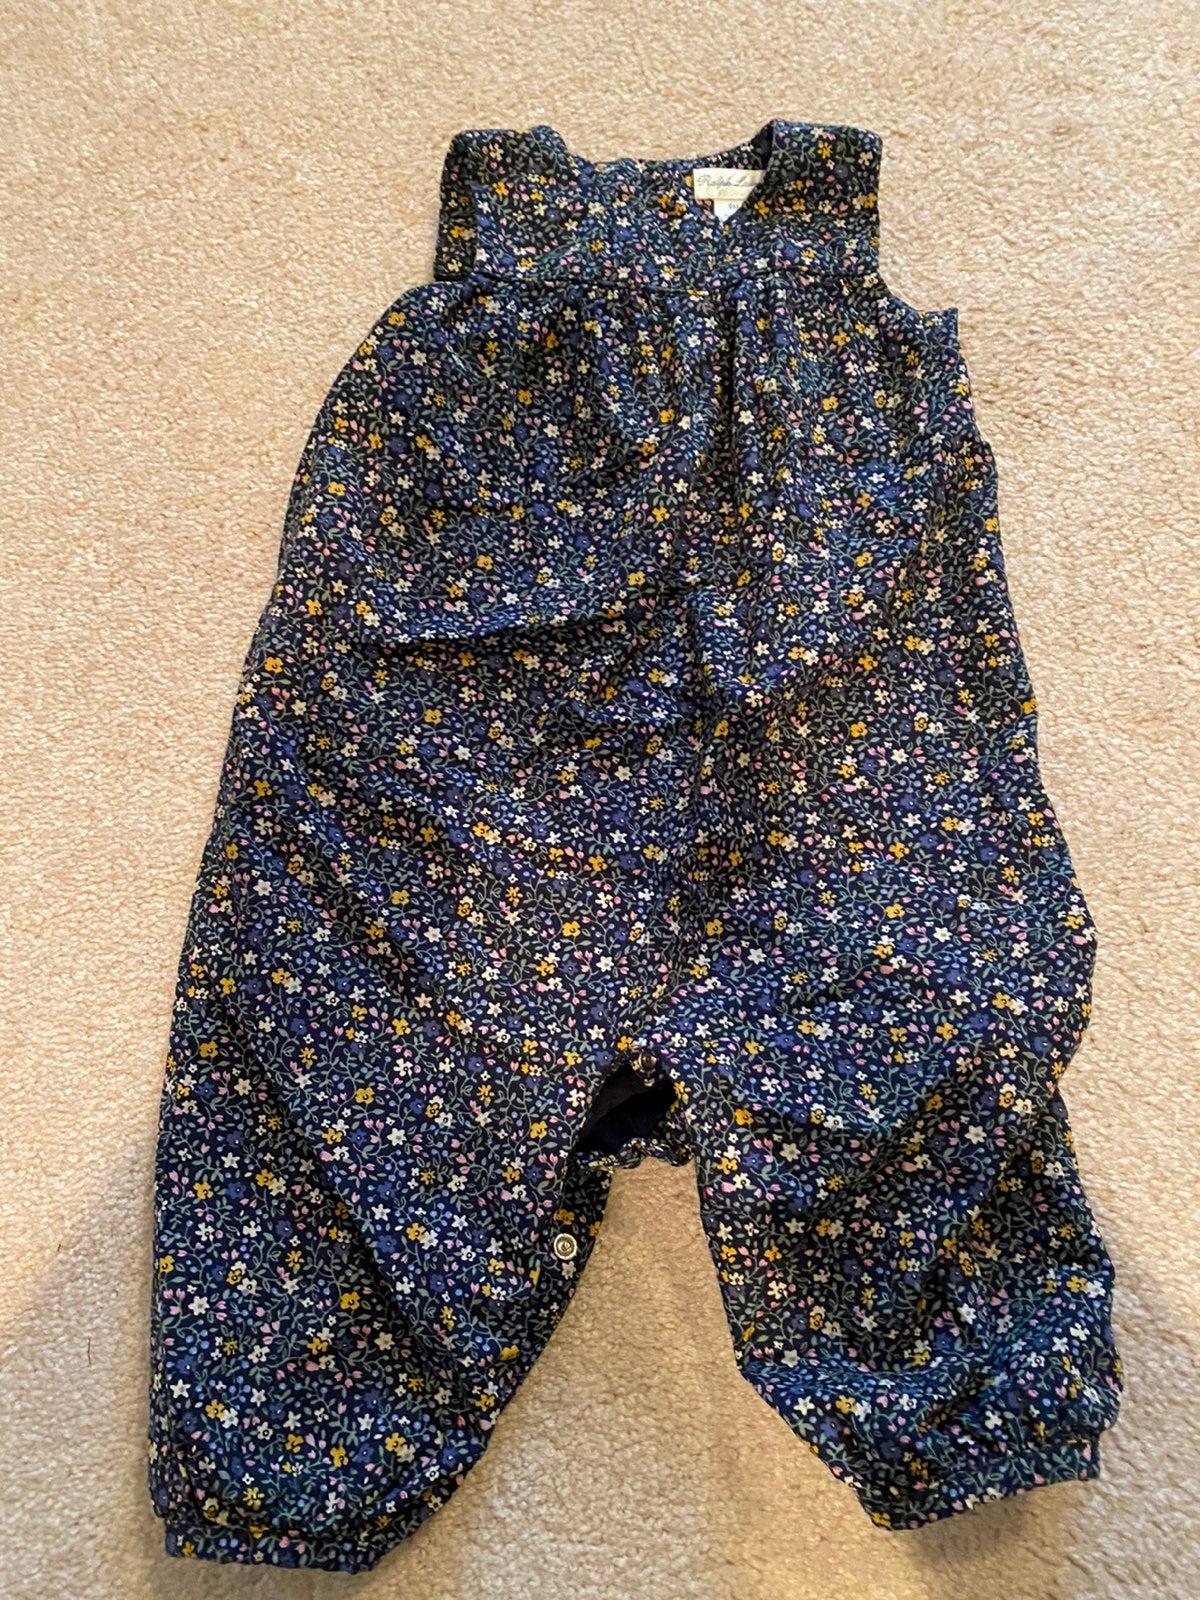 Ralph Lauren 9 month outfit